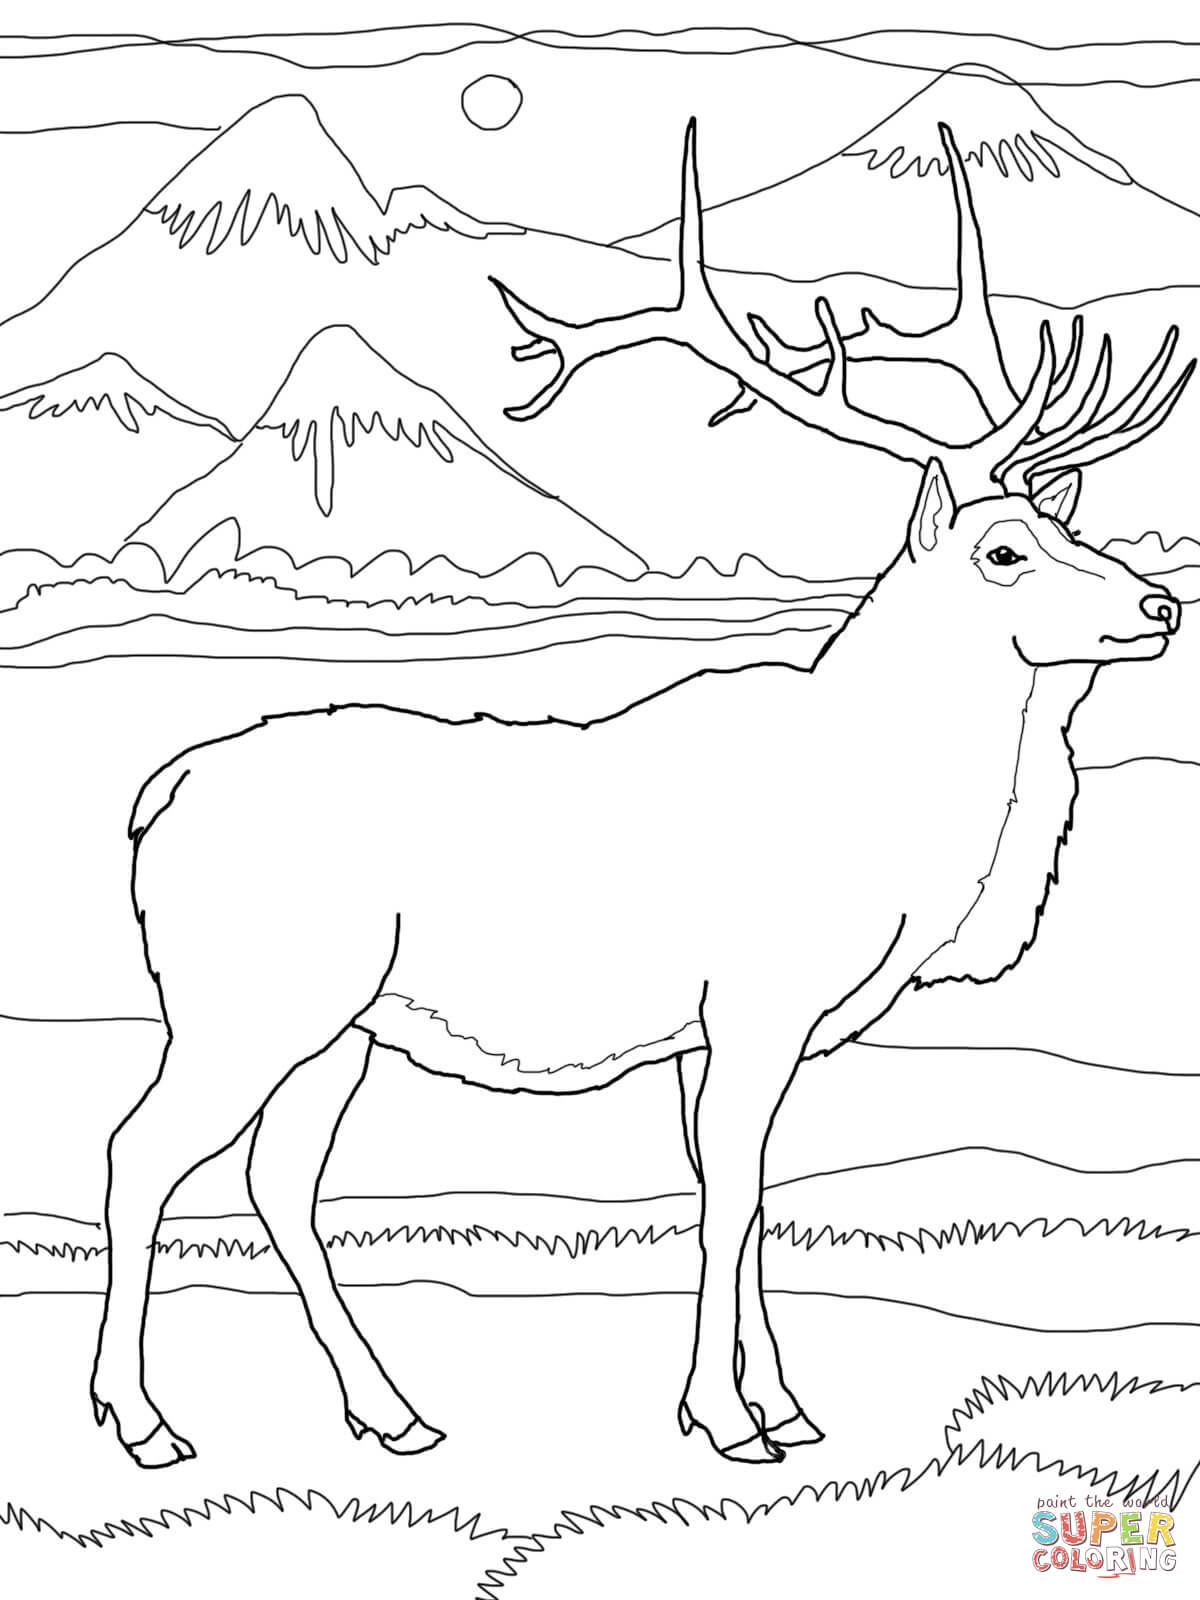 100 ideas Baby Elk Coloring Pages on emergingartspdxcom